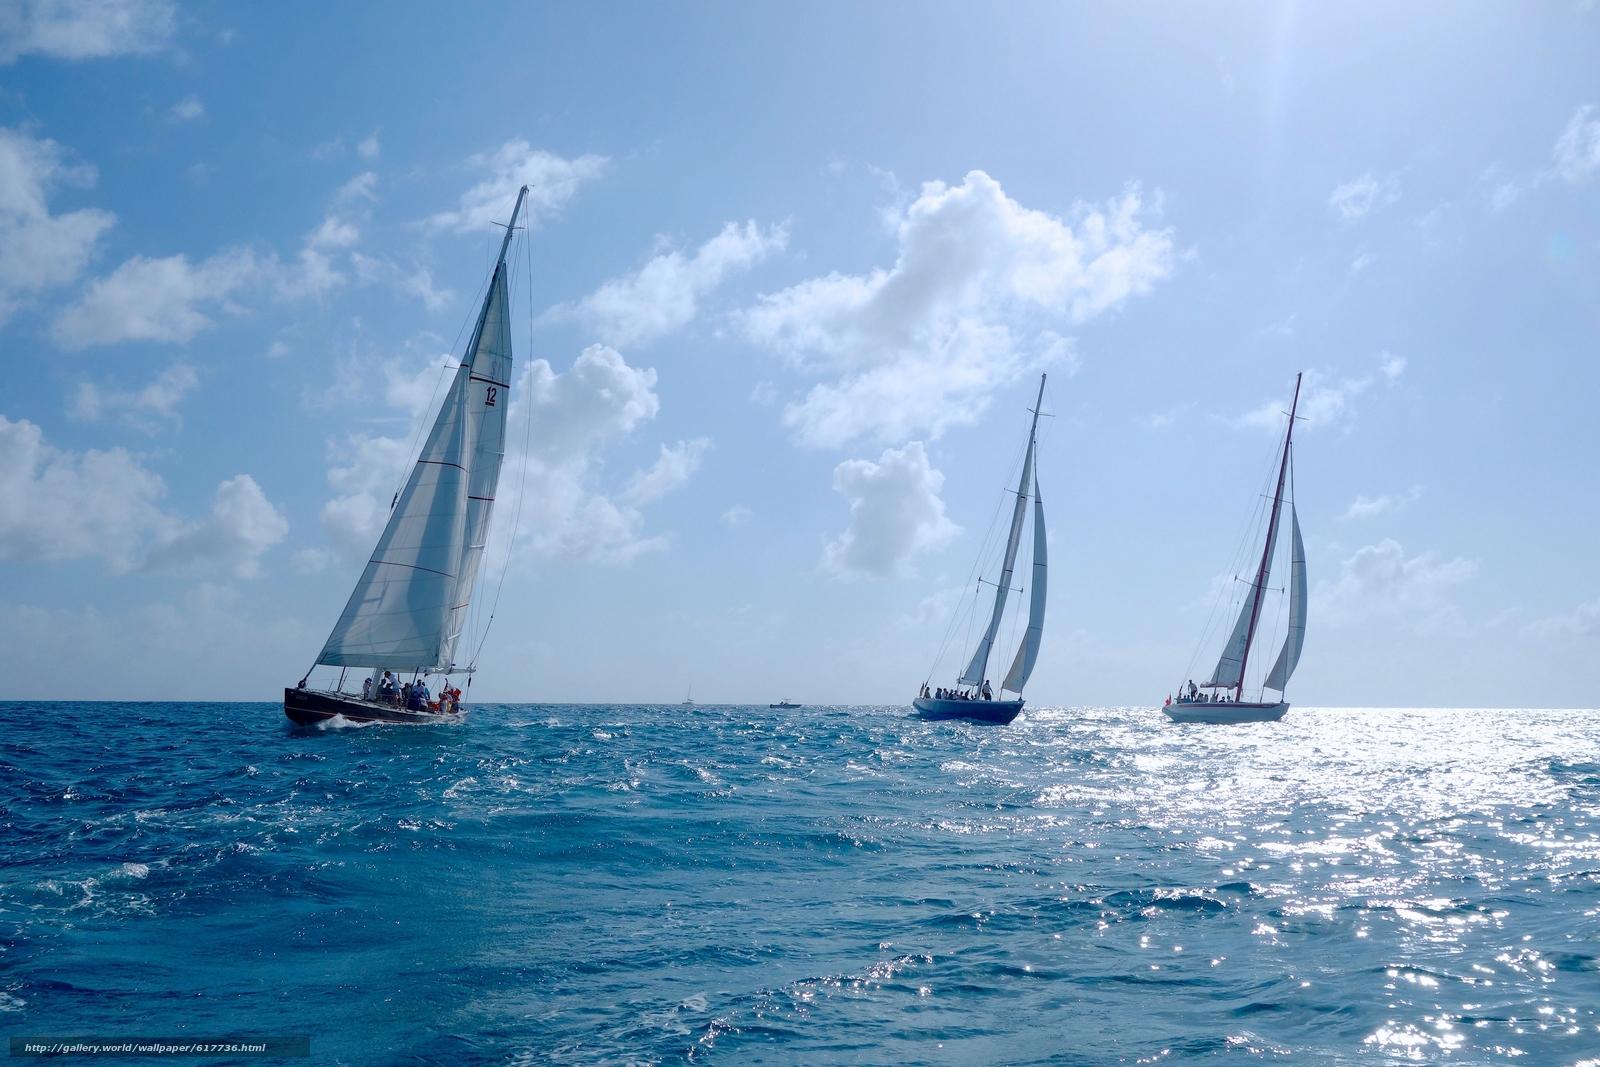 Sint Maarten, Caribbean Sea, Синт-Мартен, Карибское море, яхты, регата, море